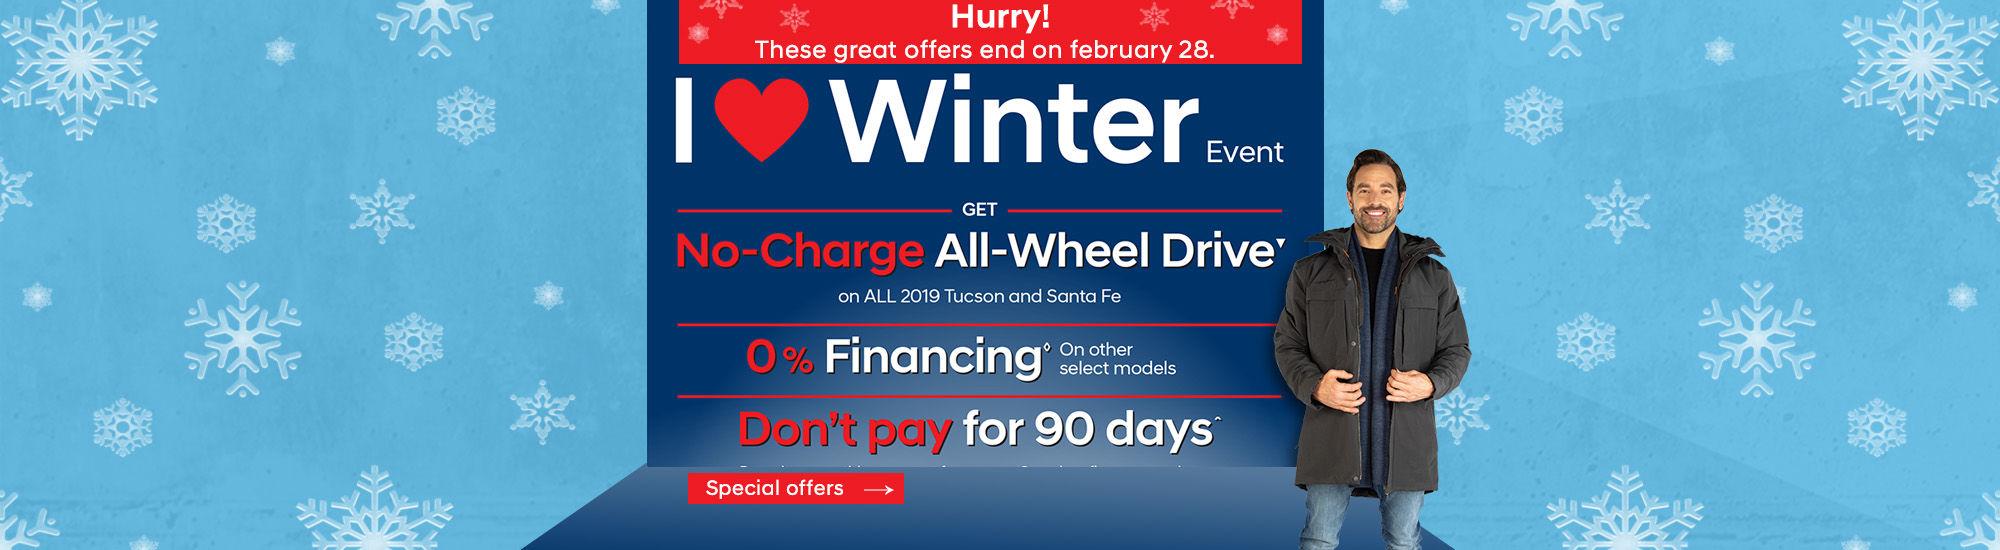 Hyundai i love winter Event